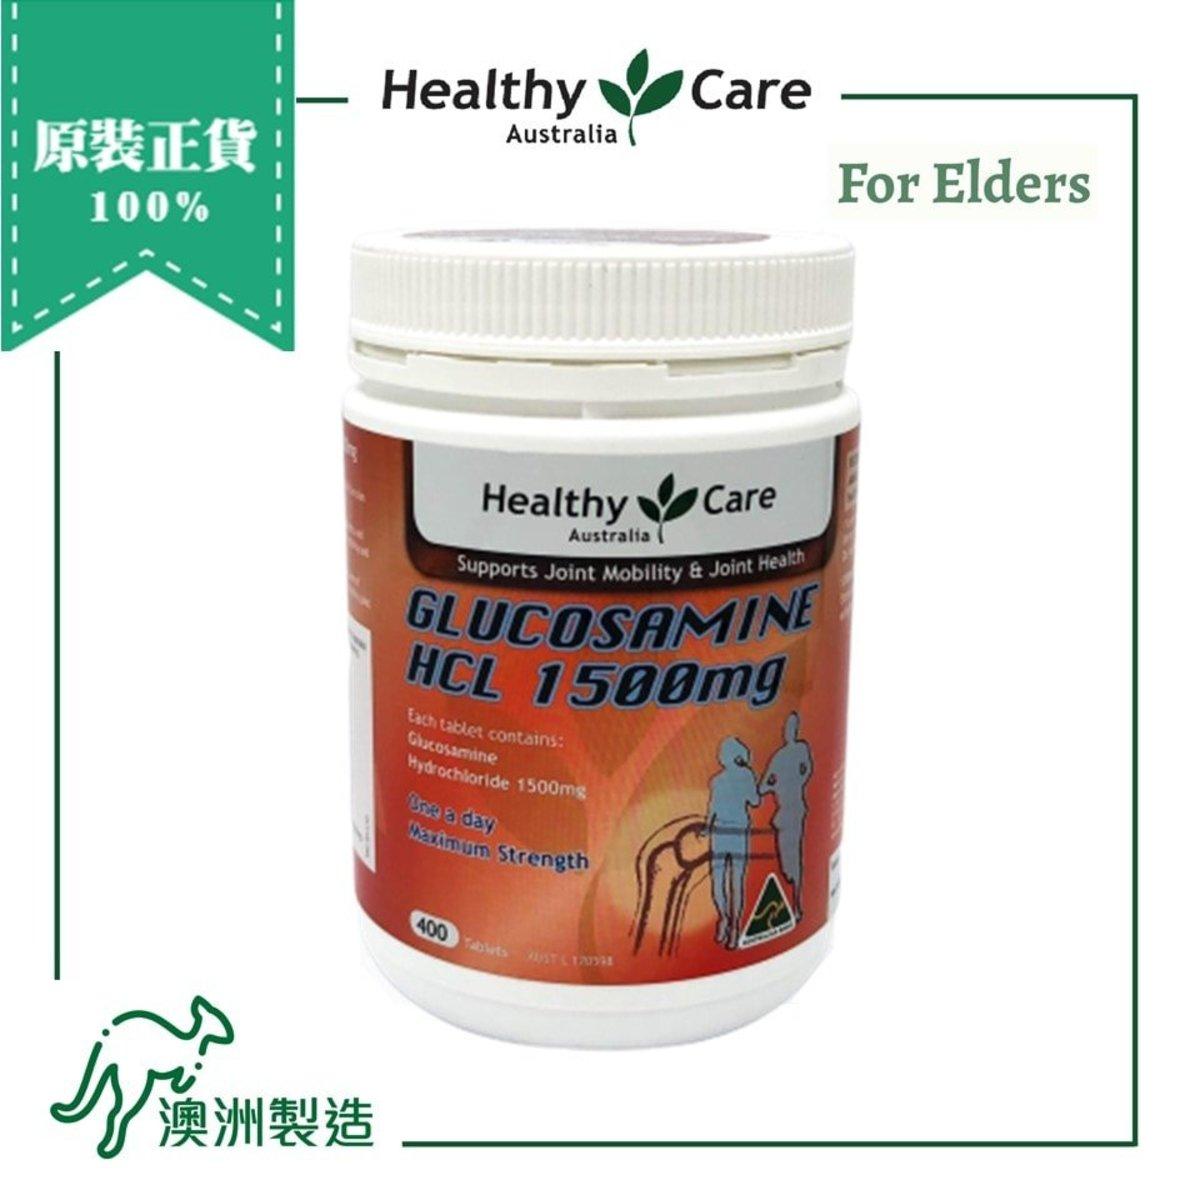 Glucosamine HCL 1500mg 400 Tablets